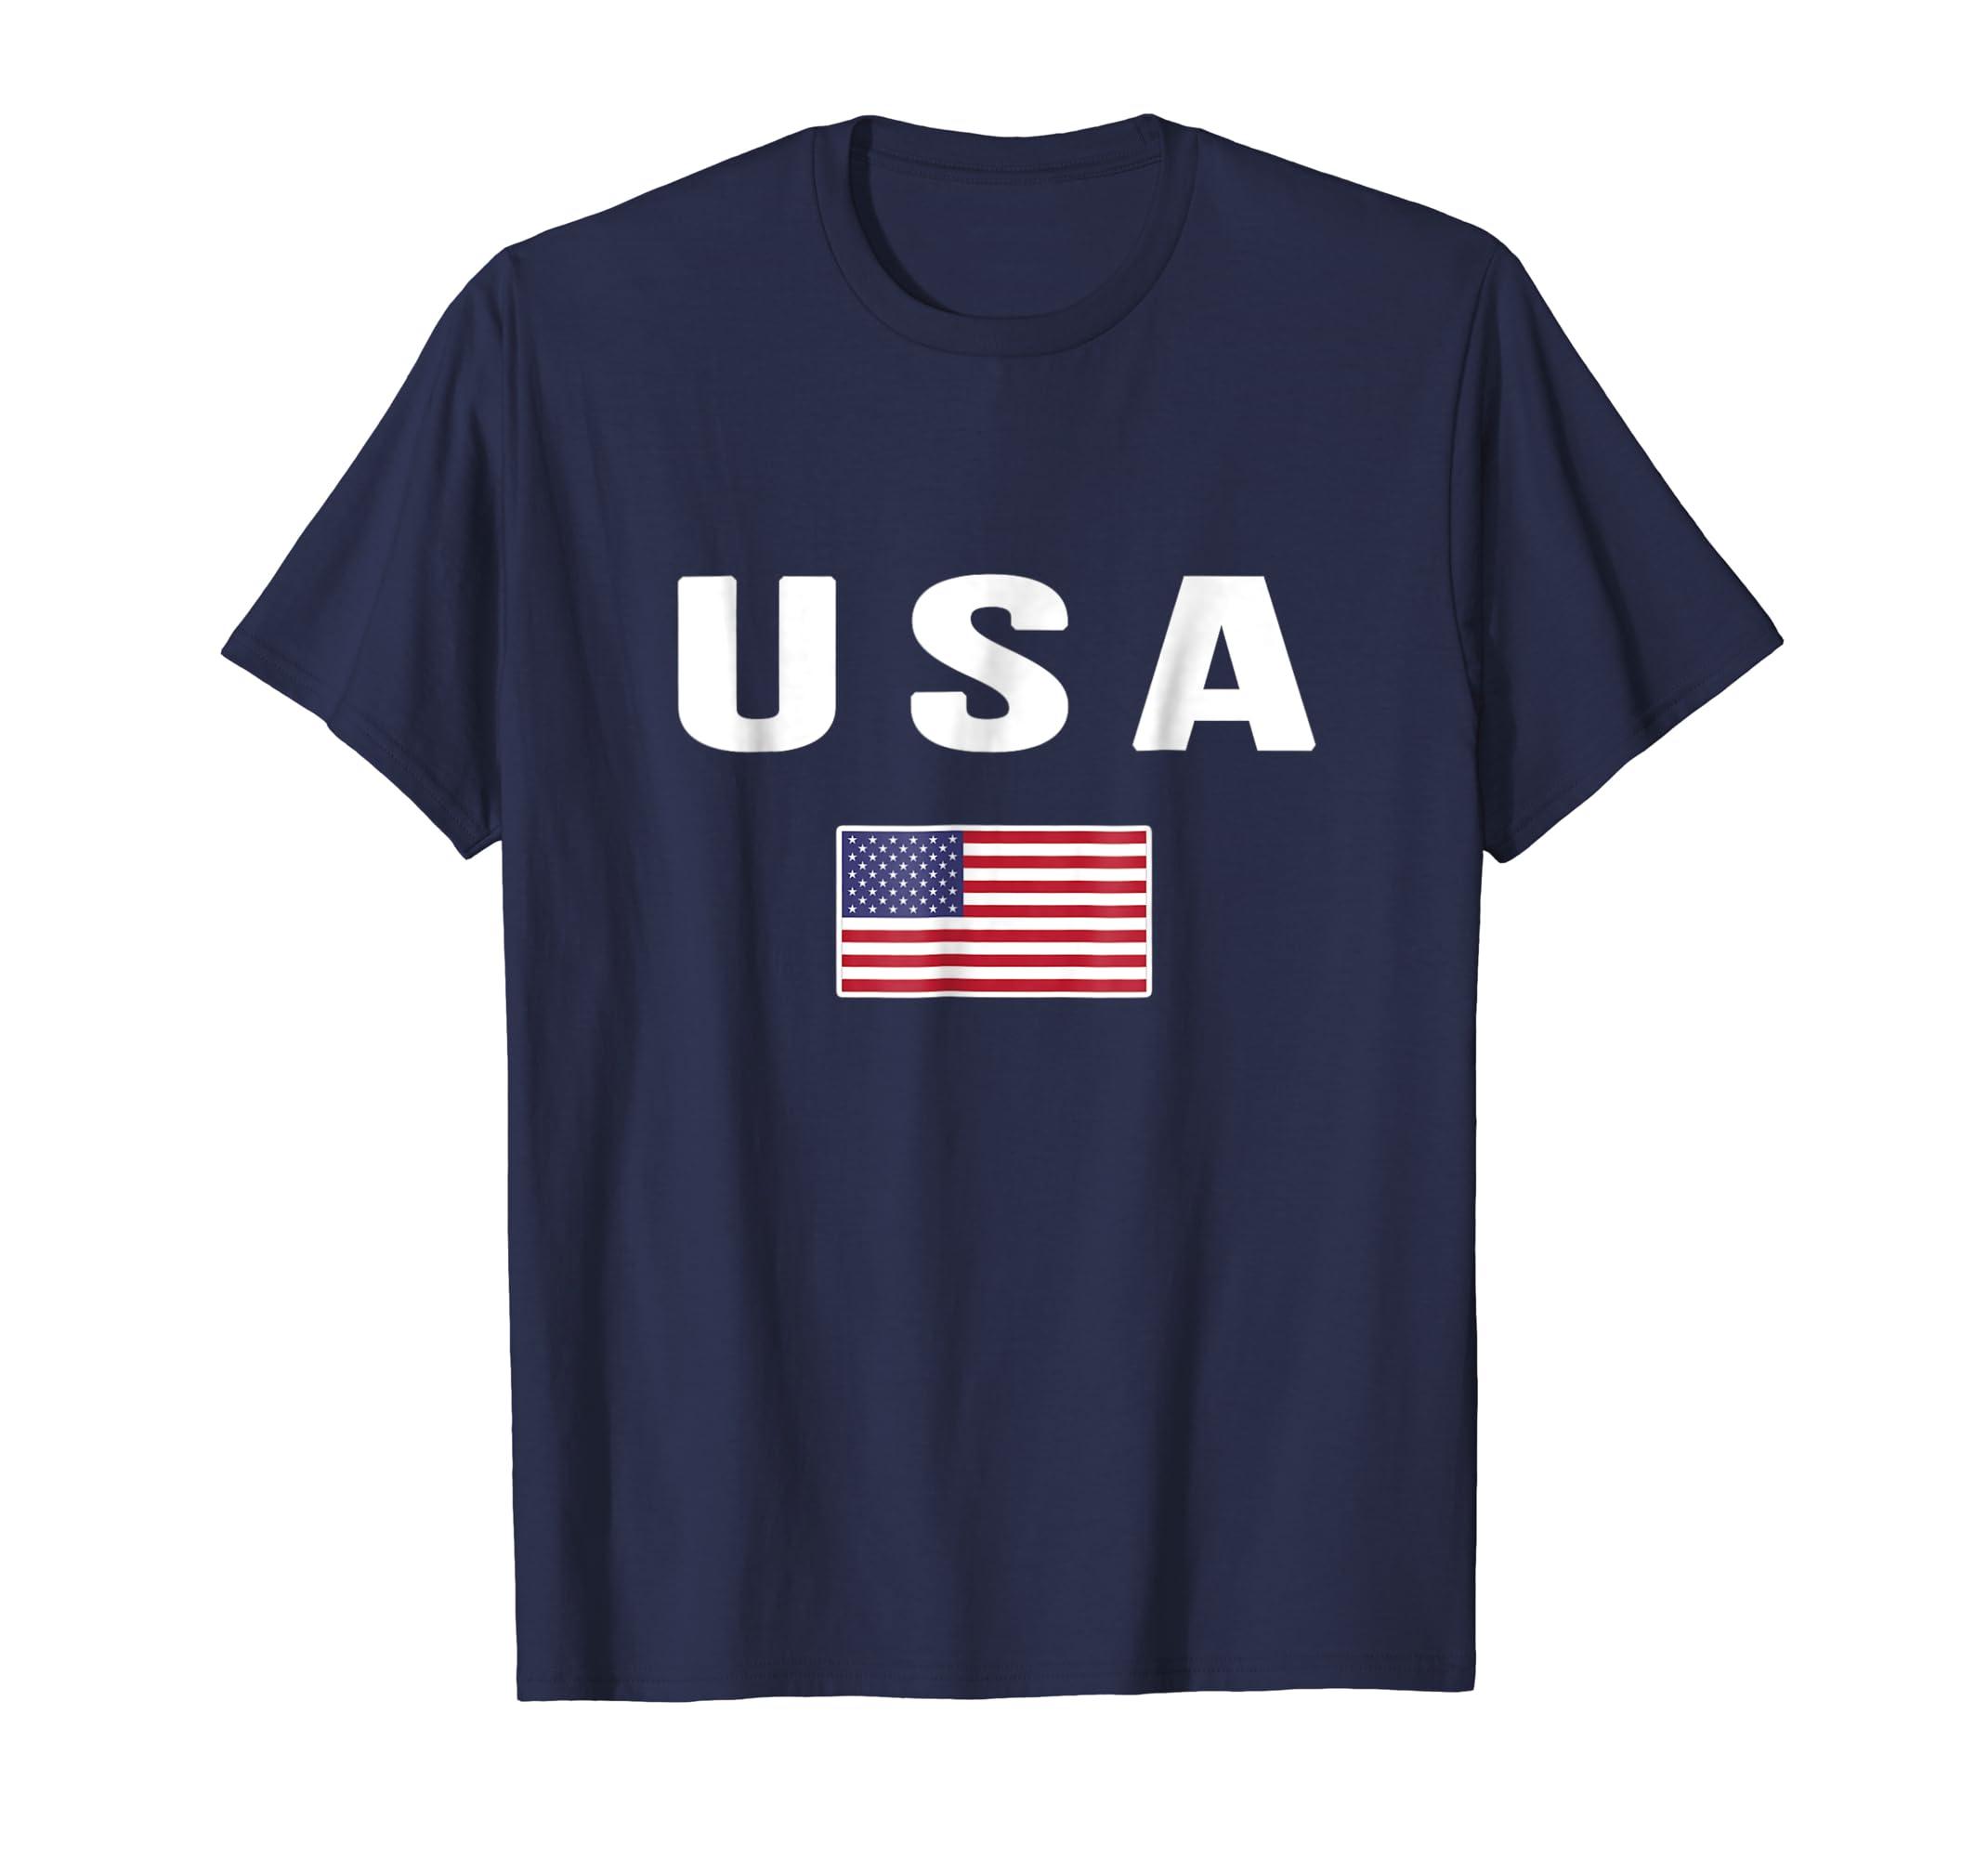 USA T shirt American Flag US America United States 4th July-azvn